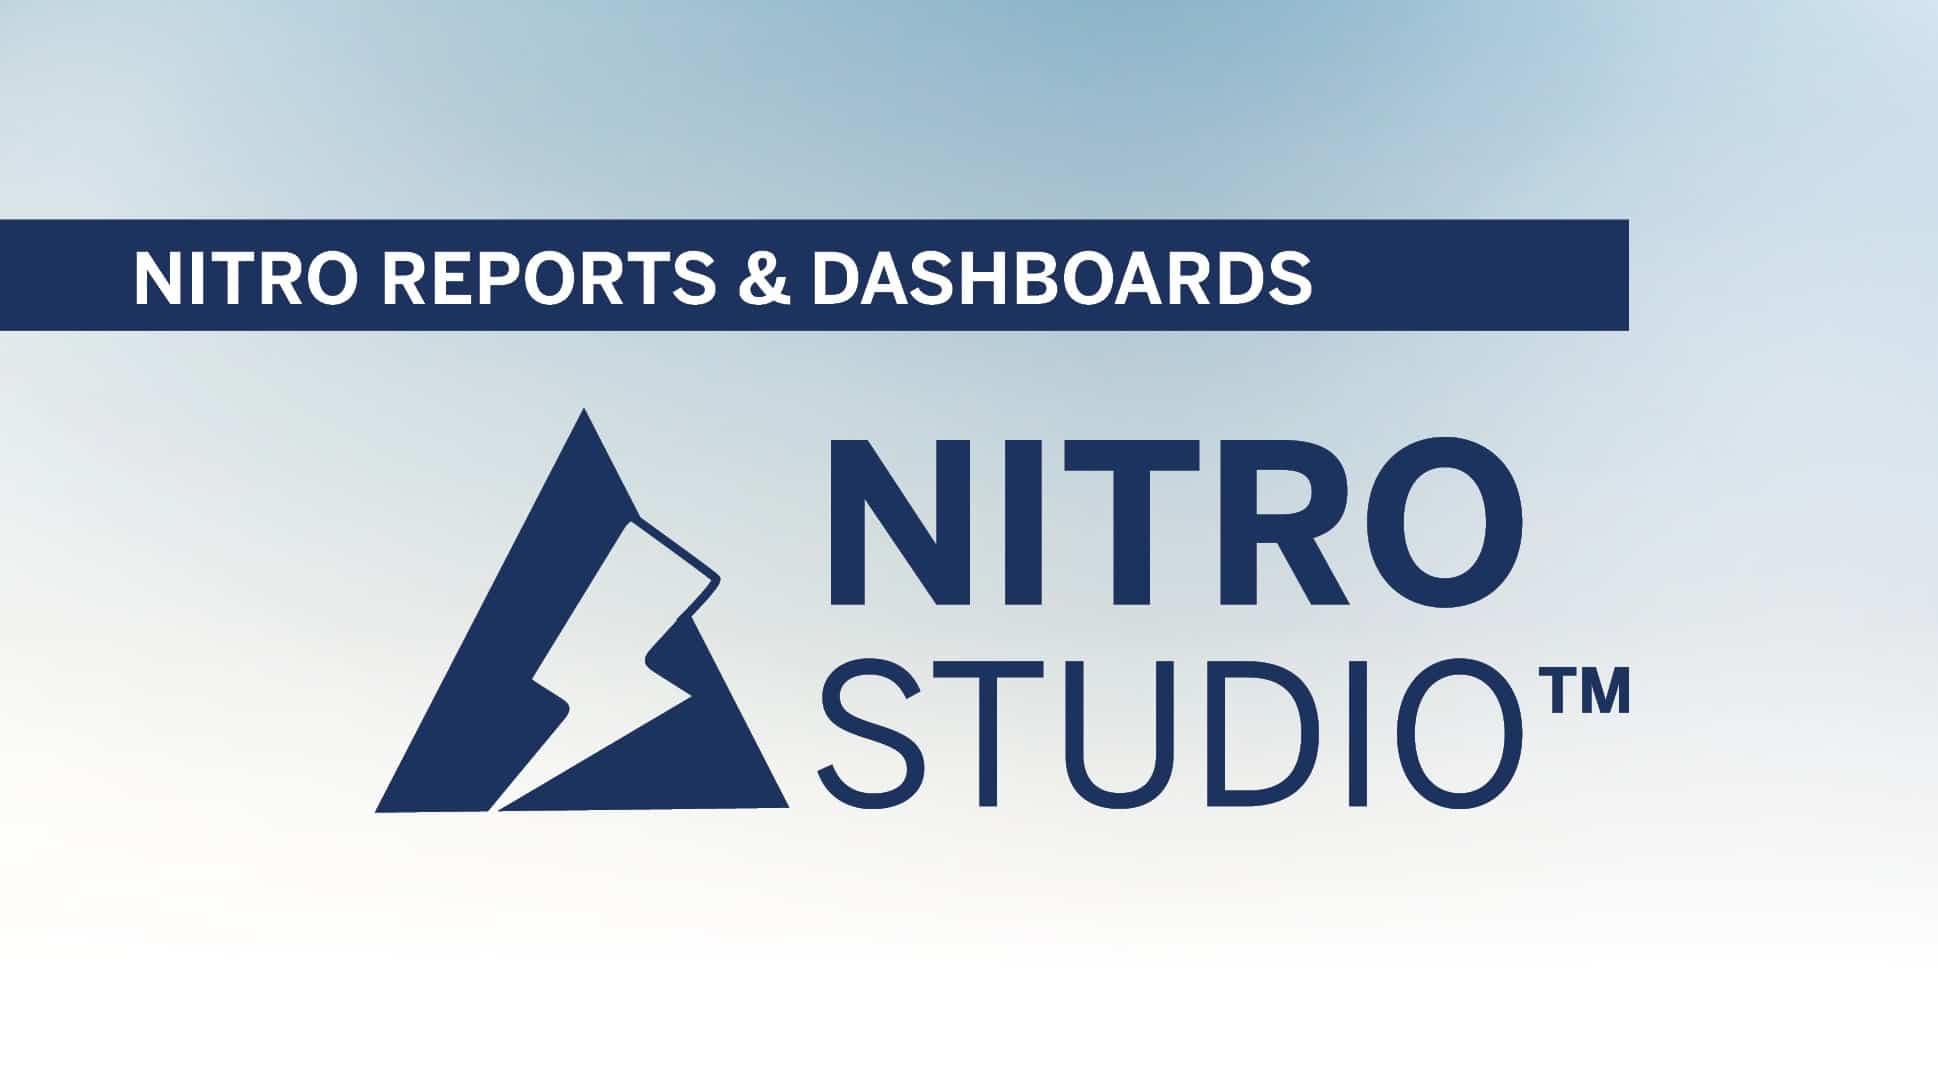 NITRO Studio Tutorial Series: Reports & Dashboards